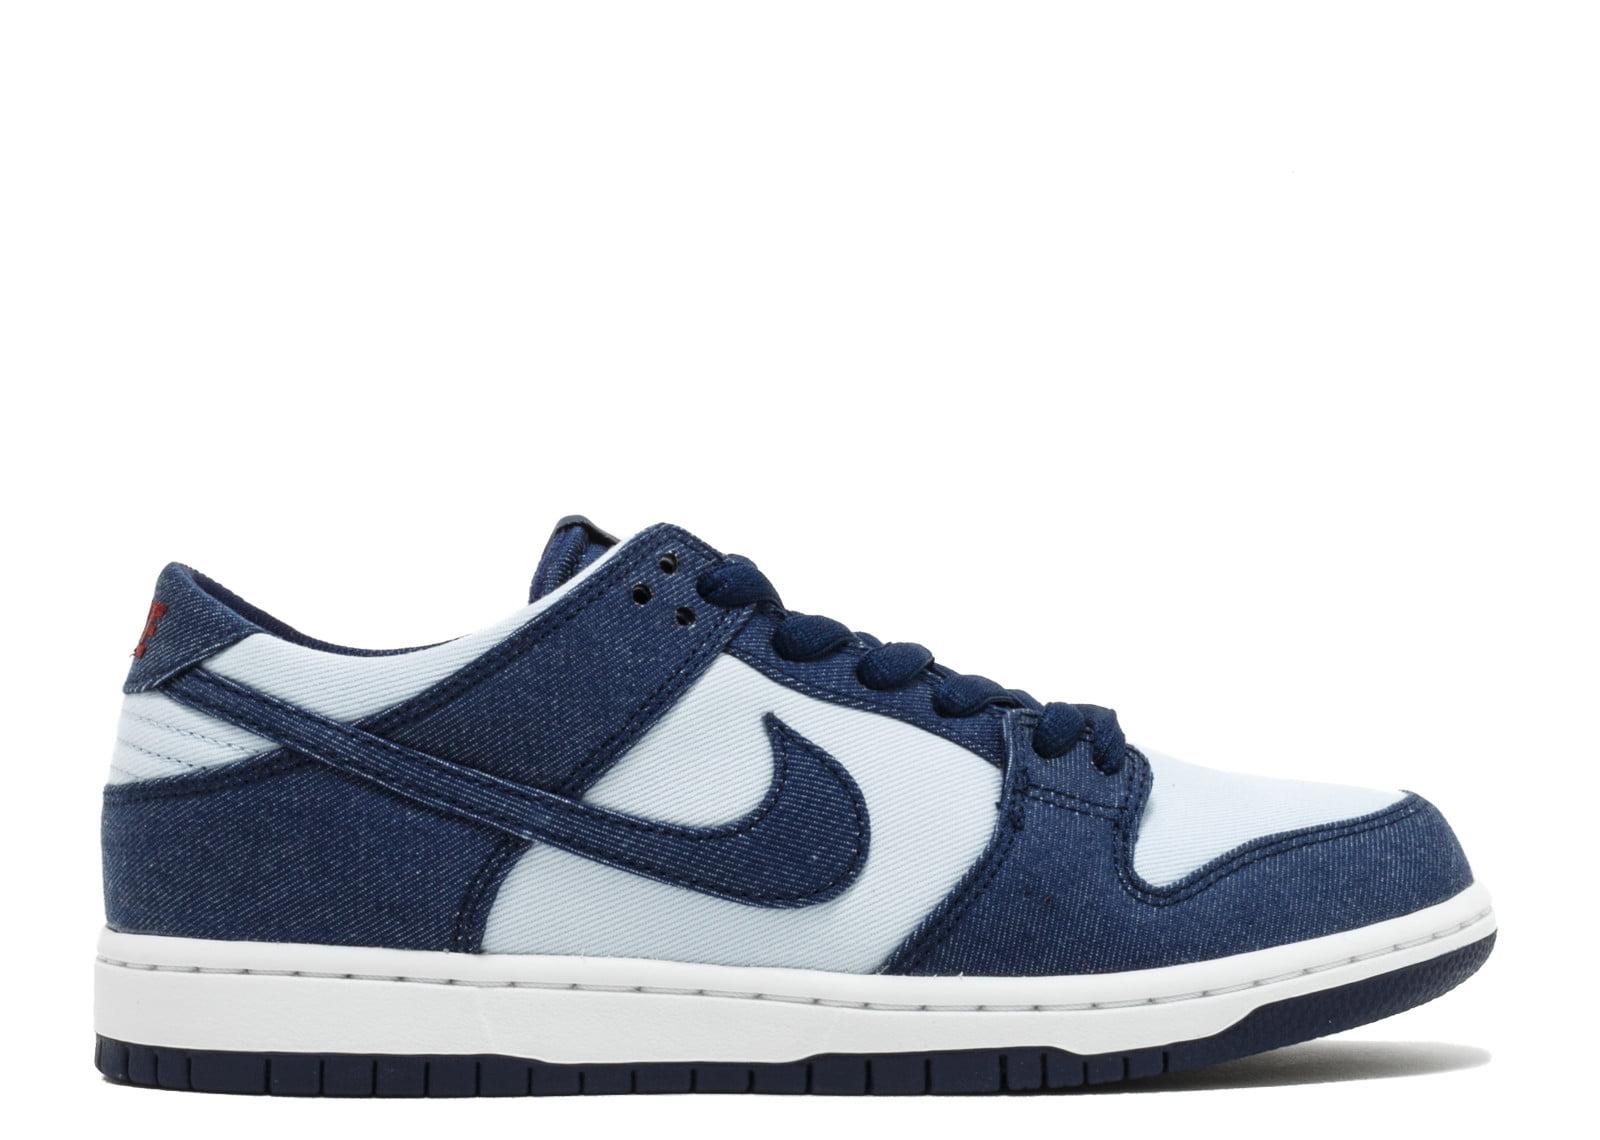 brand new 3c4e0 a3dfa Nike - Men - Nike Sb Zoom Dunk Low Pro 'Binary Blue' - 854866-444 - Size  11.5